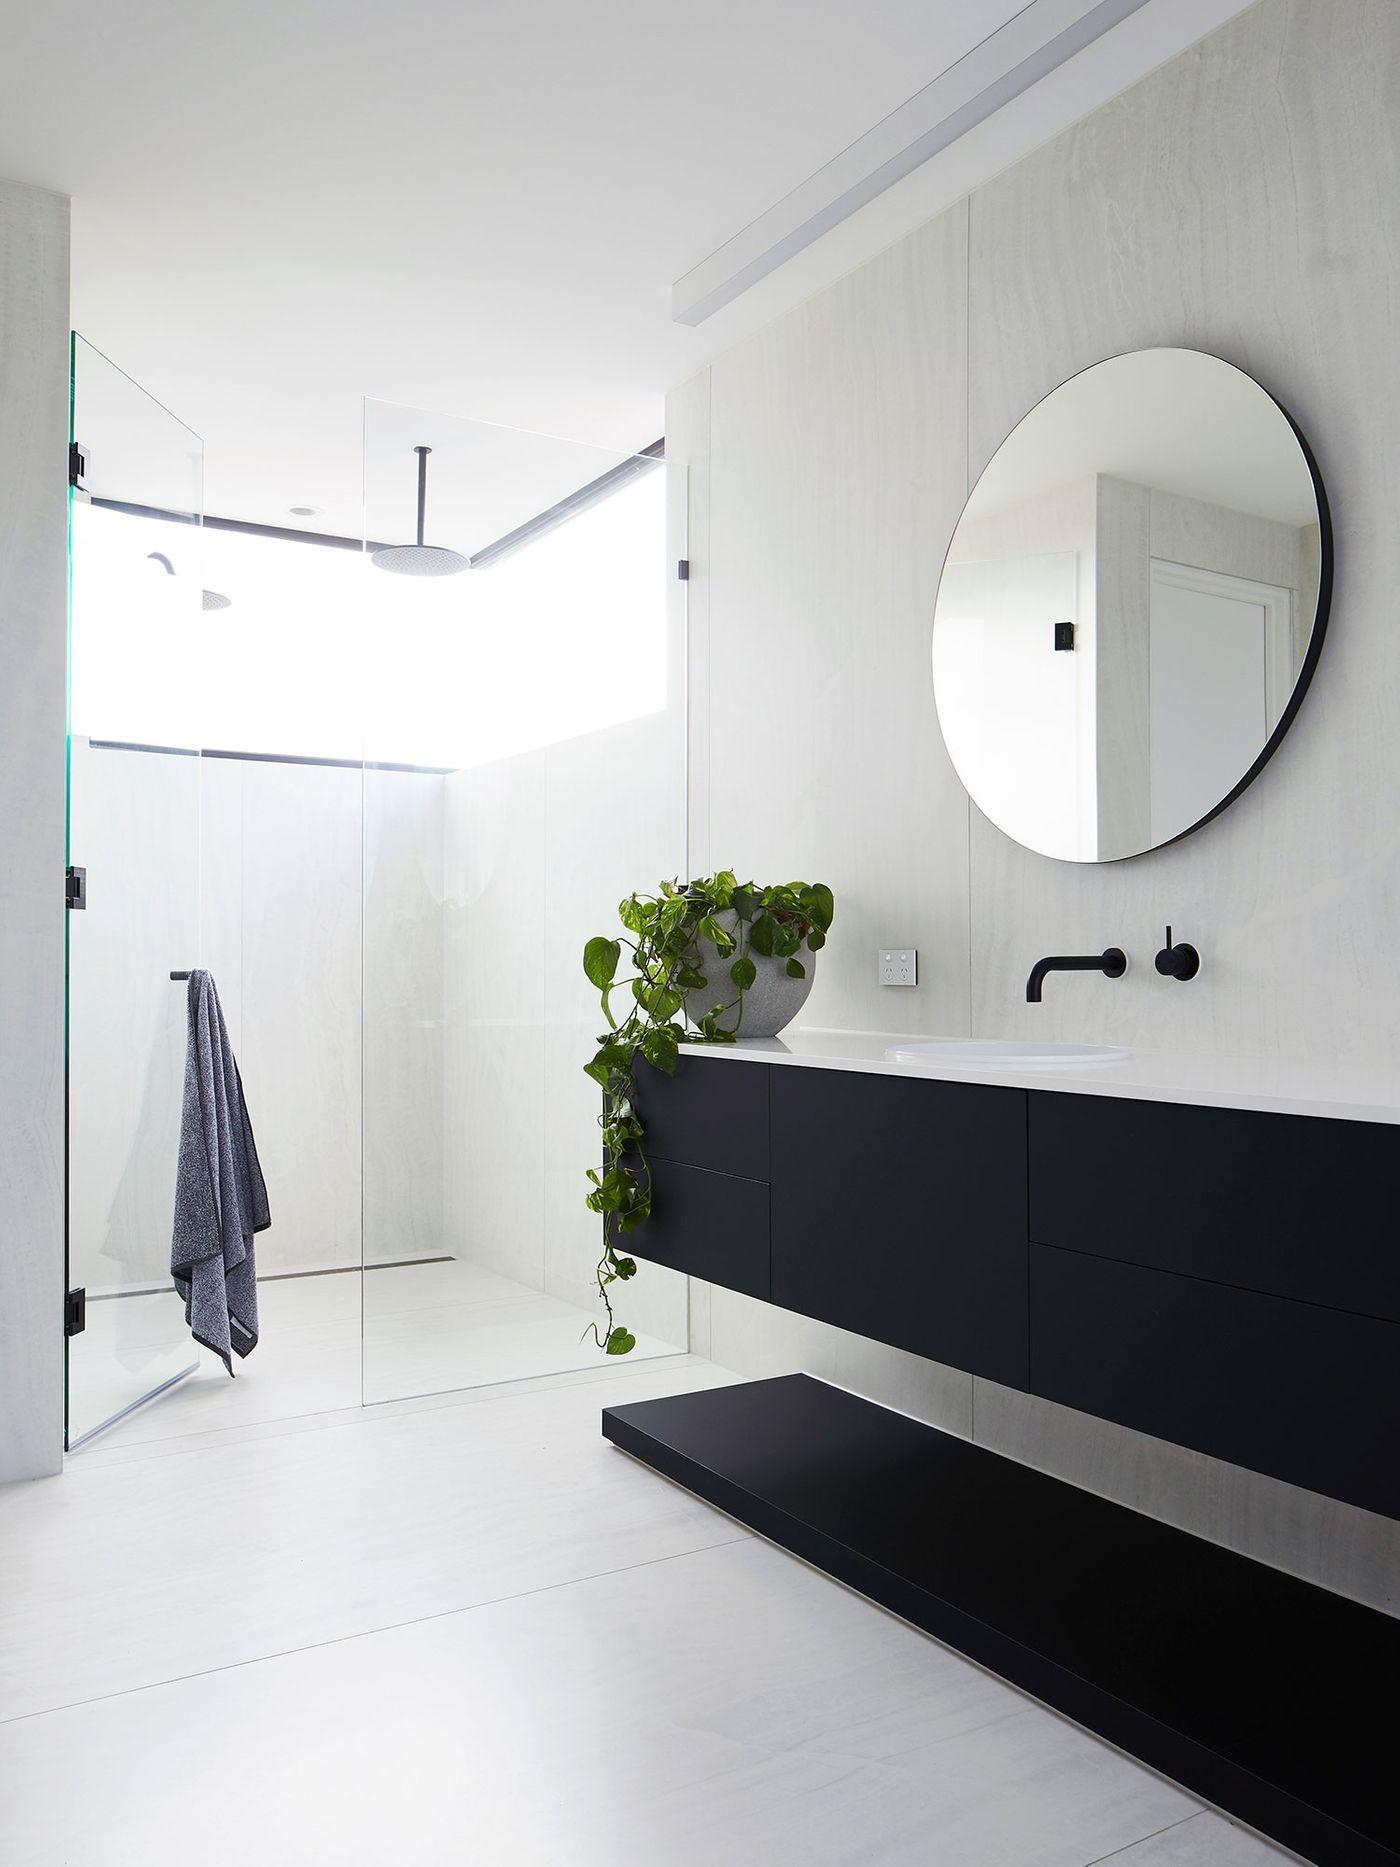 bathroom vanities, black floating cabinet with white top, black floor shelves, round mirror